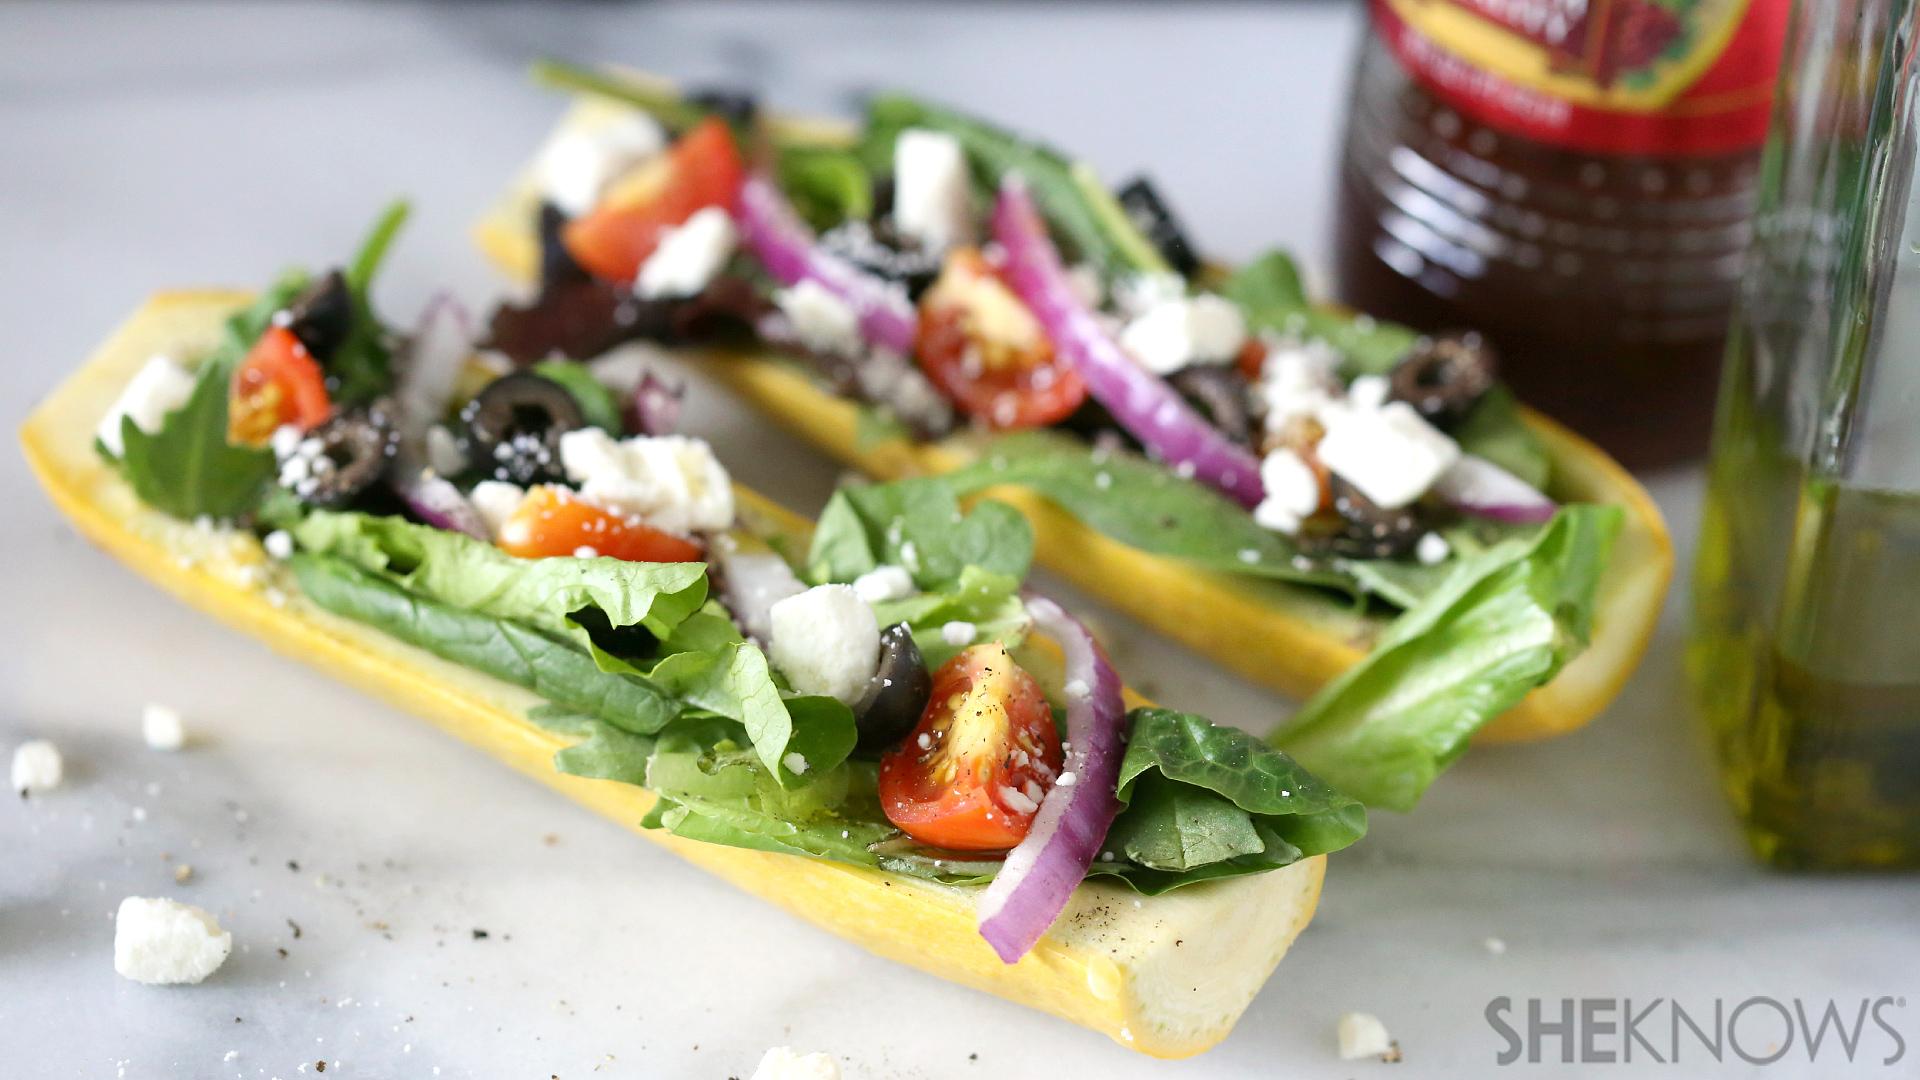 Squash stuffed with Greek feta salad